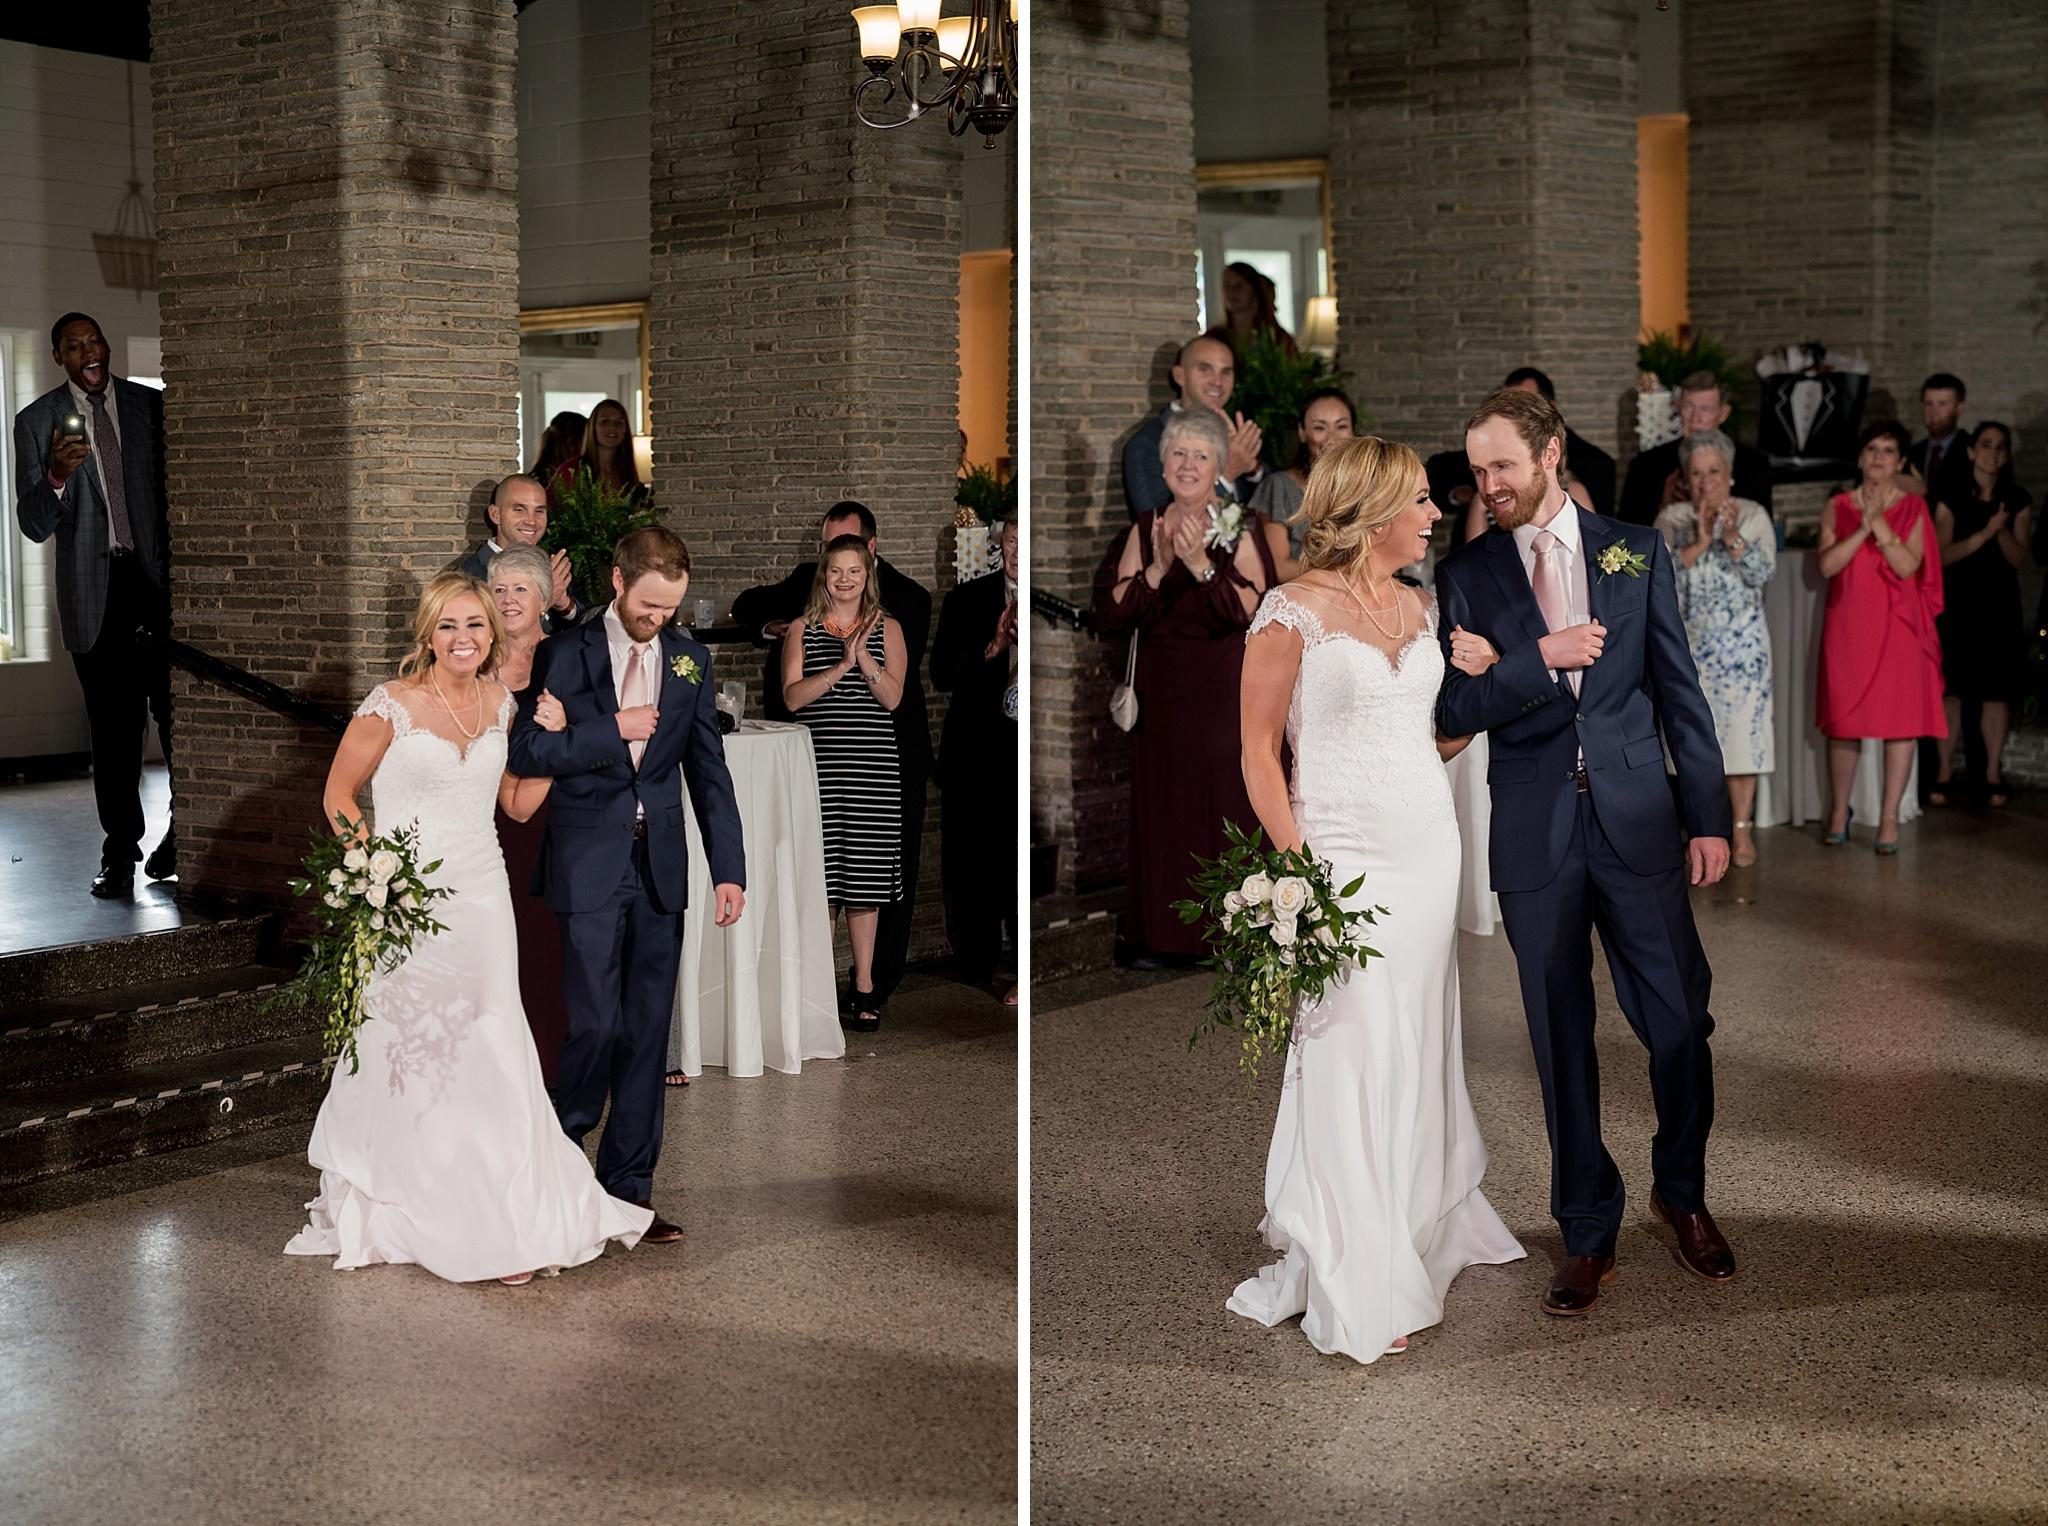 Williamston-NC-Wedding-Photographer-048.jpg